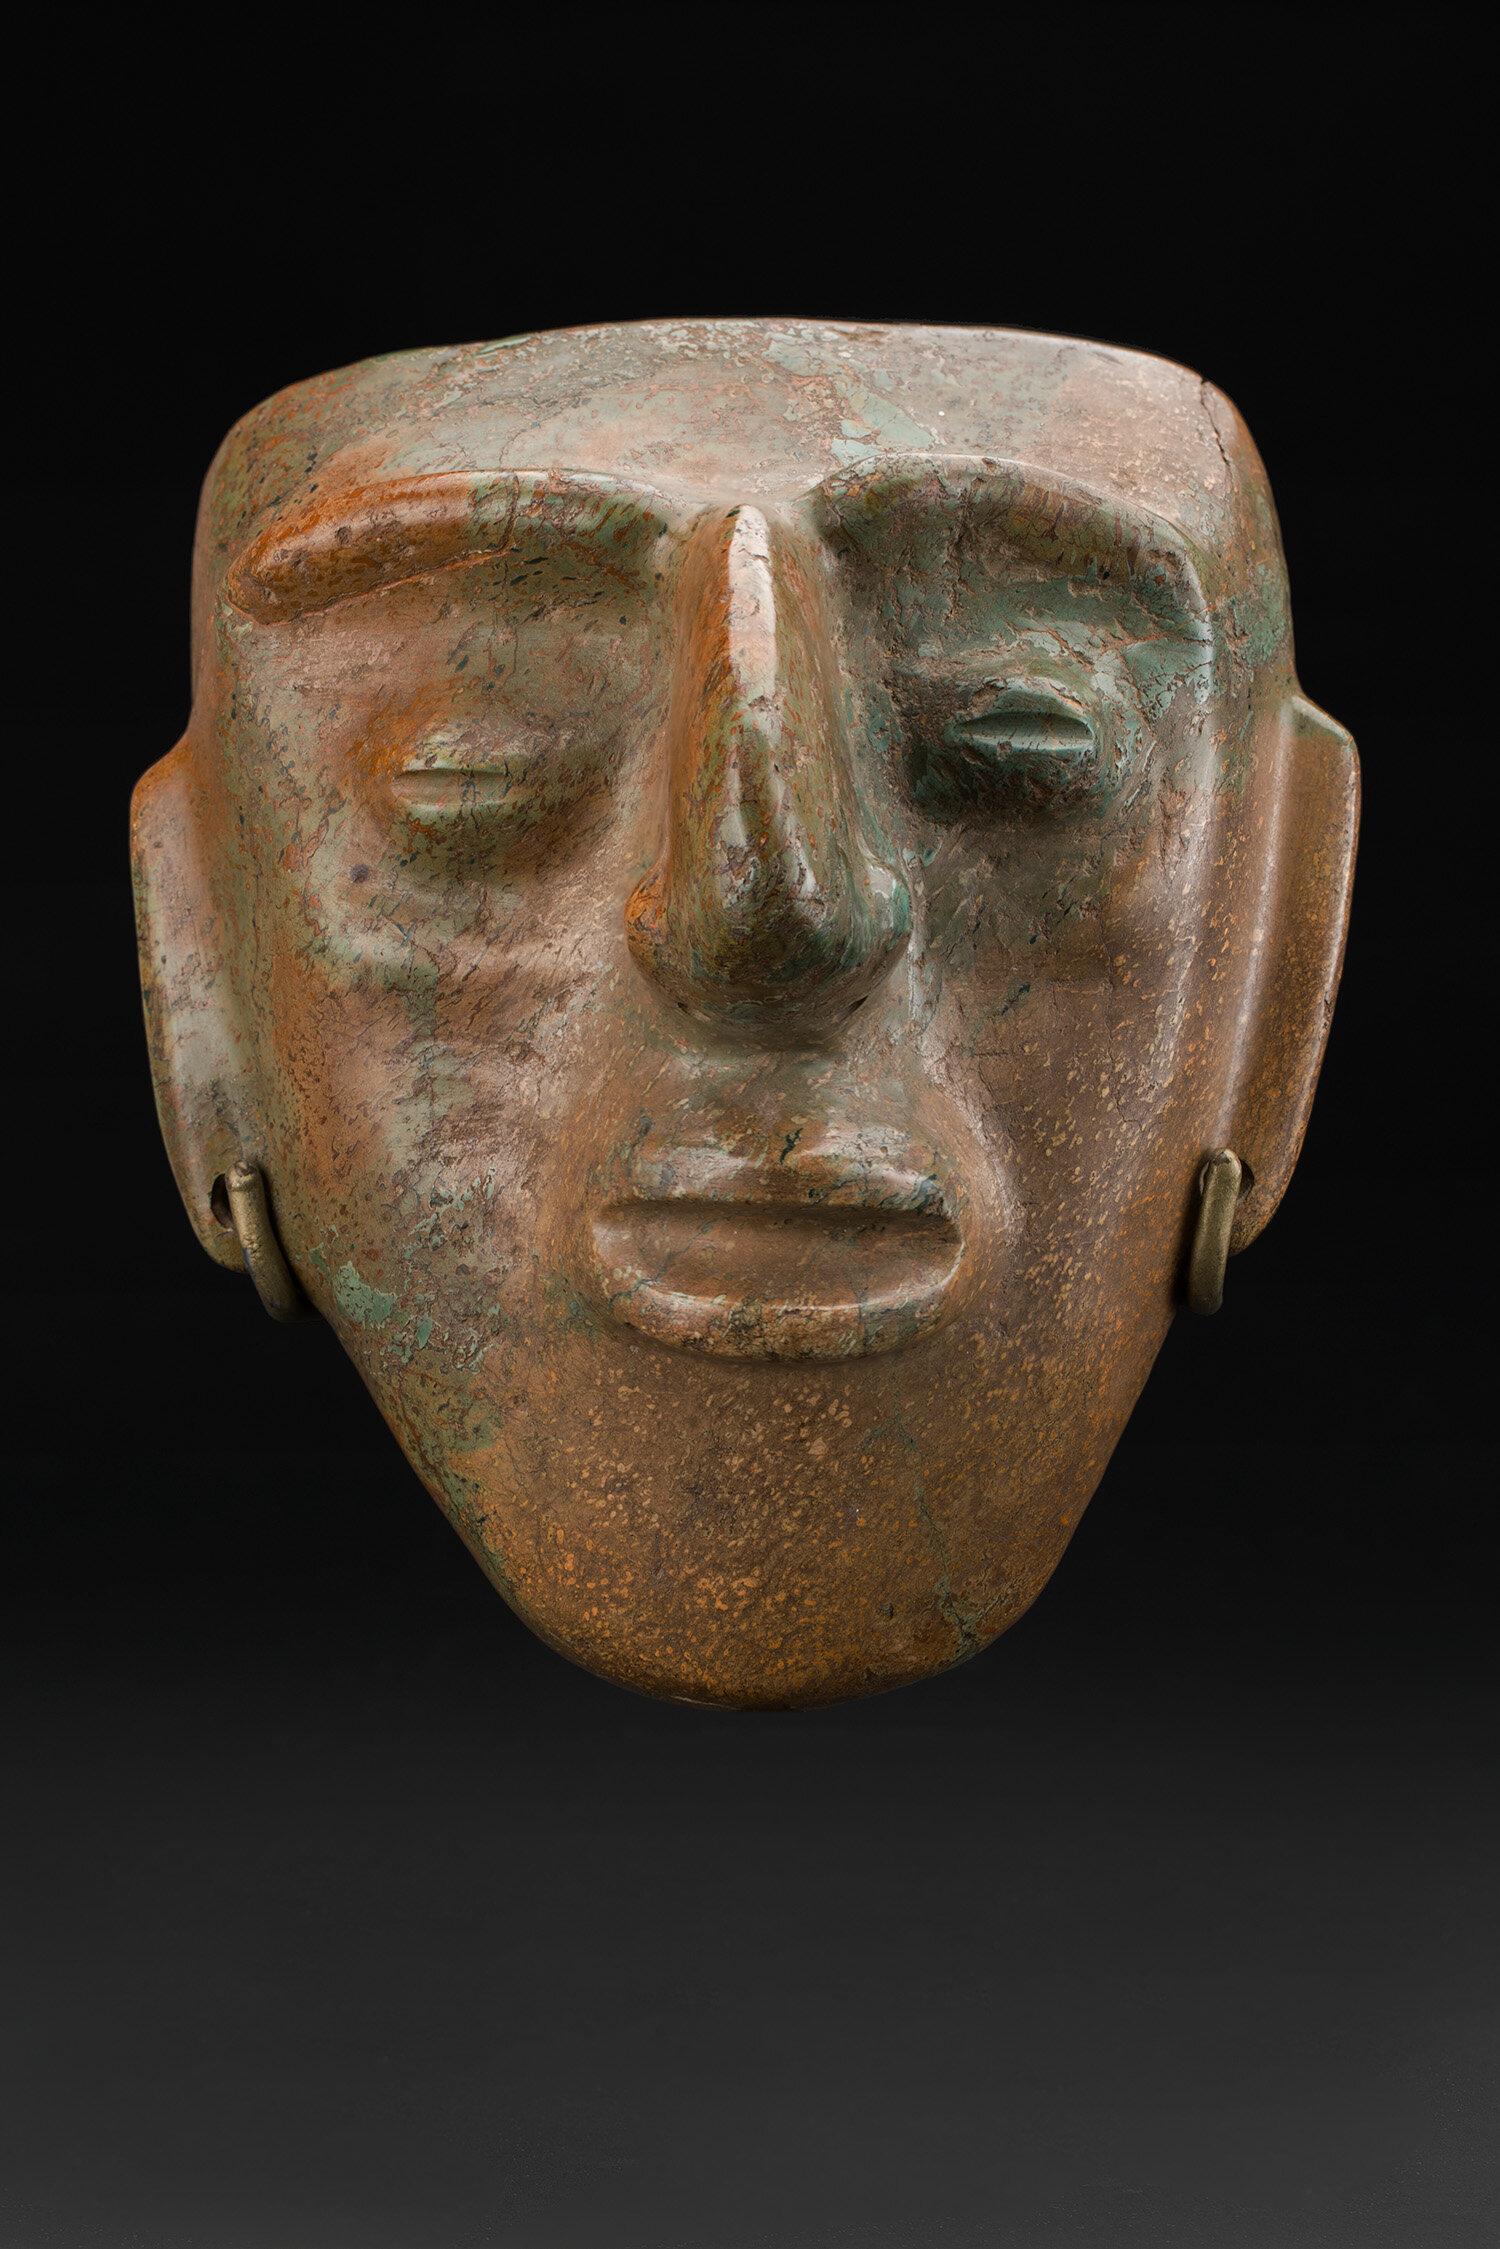 Masks  Chontal  , 200 BC - 200 AD Green stone 8 x 6.75 x 5 inches 20.3 x 17.1 x 12.7 cm M 402